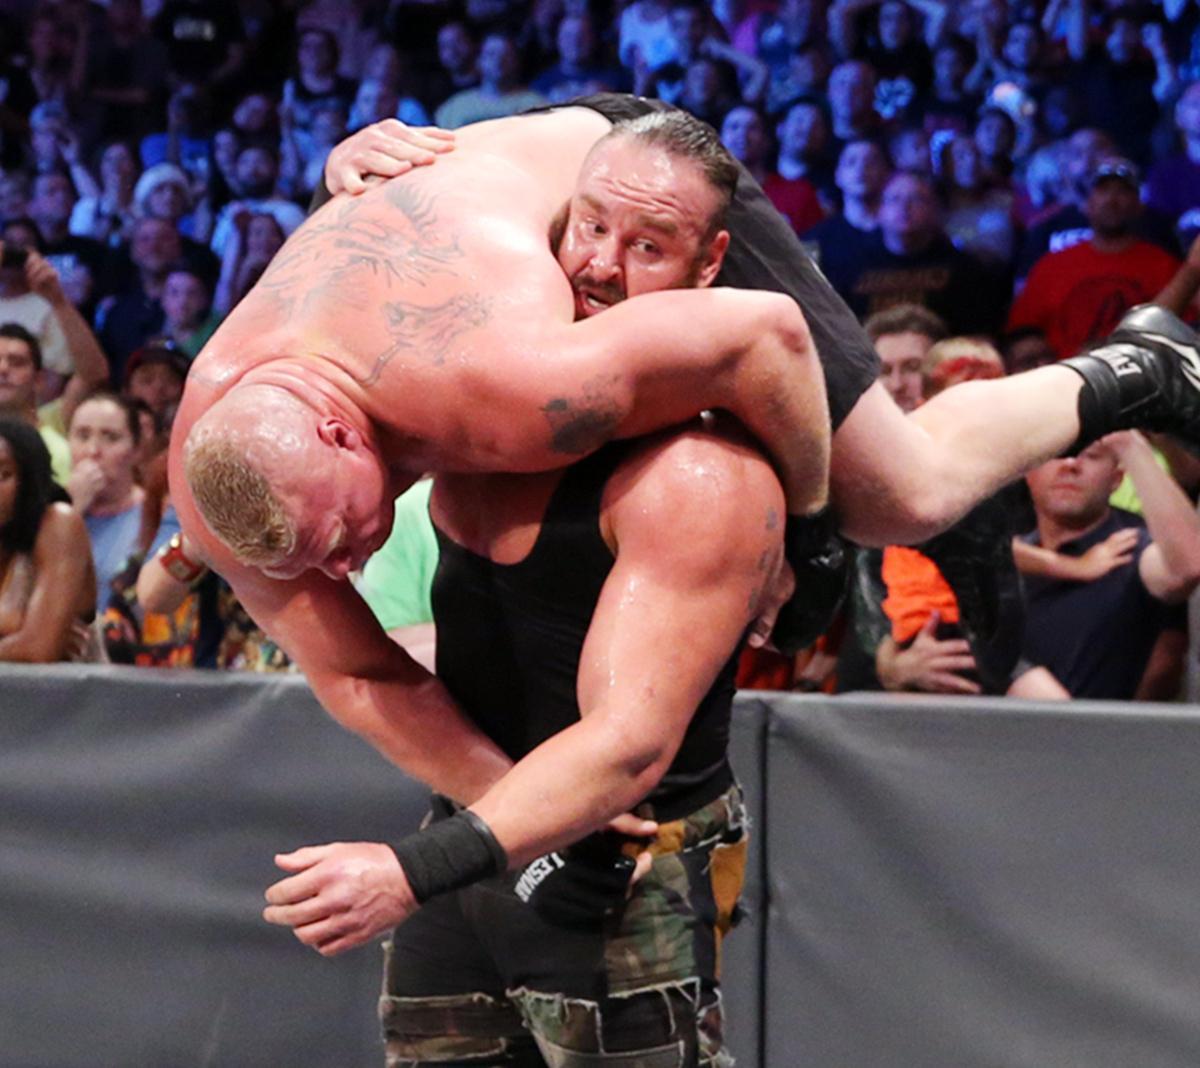 WWE SummerSlam 2017: Star Ratings For AJ Styles Vs. Kevin